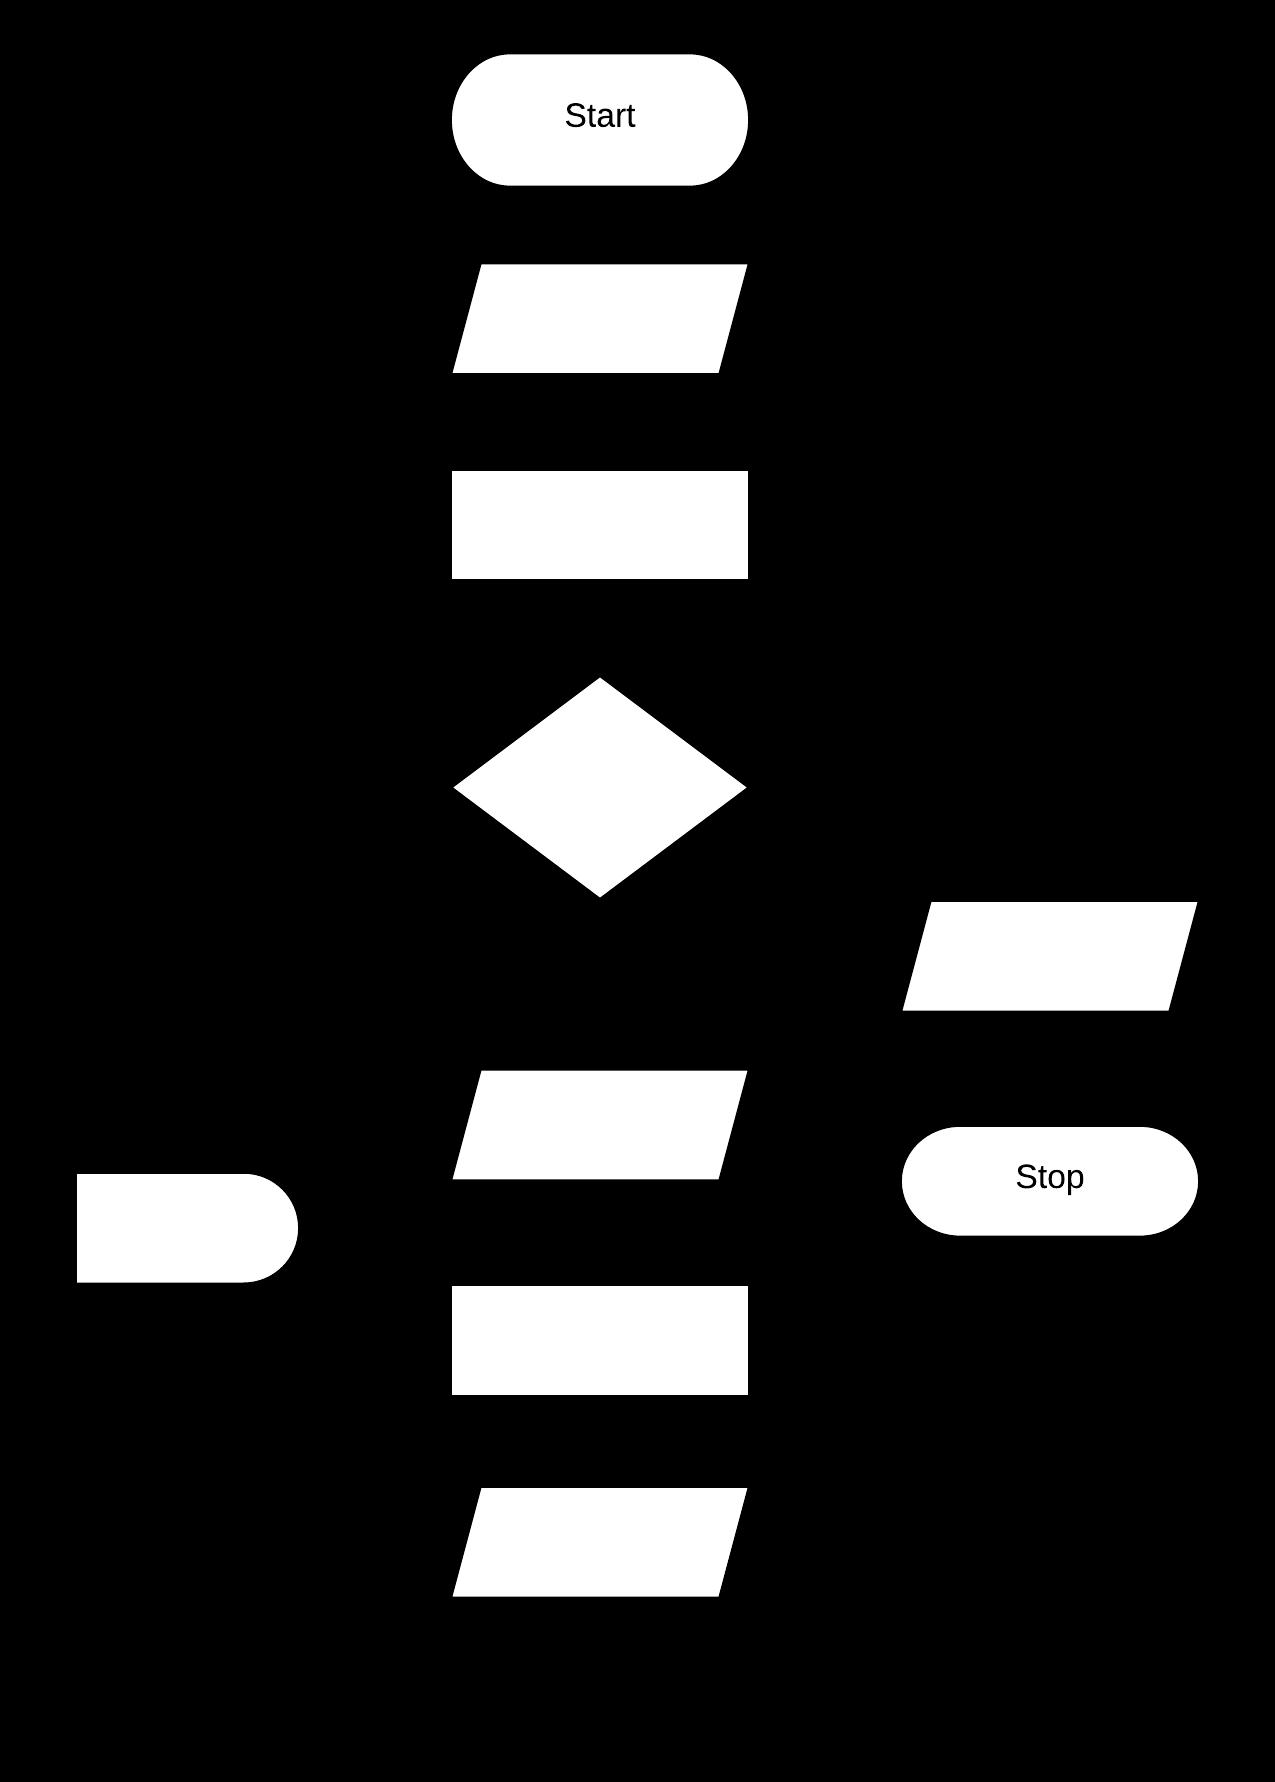 blank flowchart